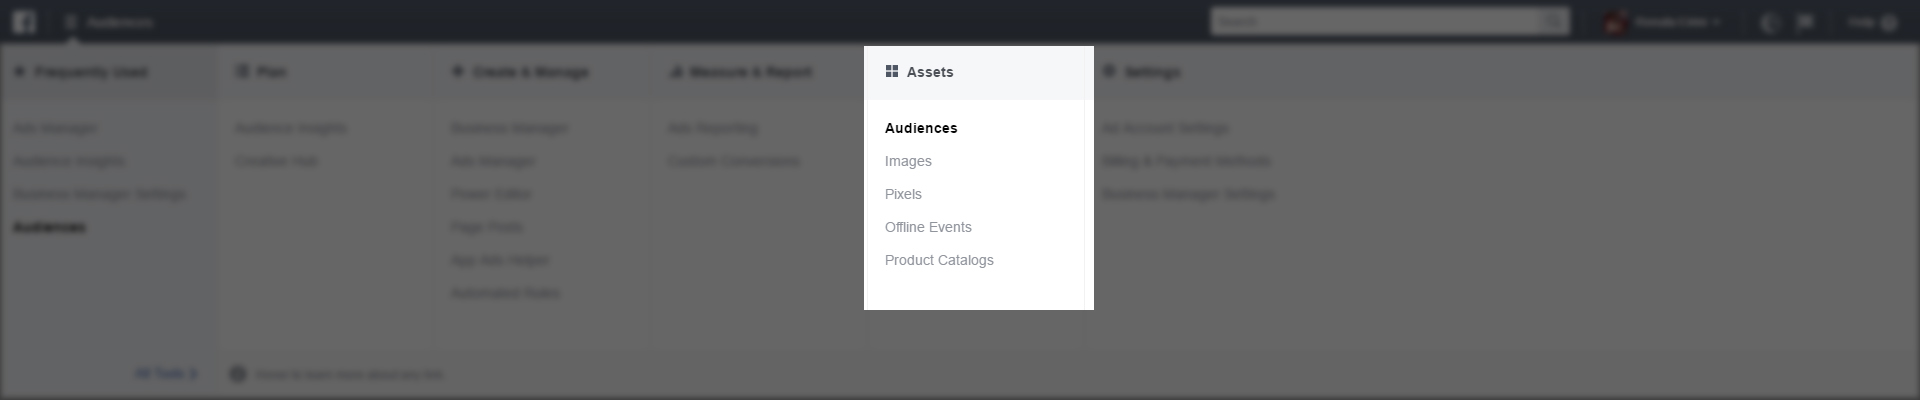 screencapture-facebook-ads-manager-audiences-manage-1-copy